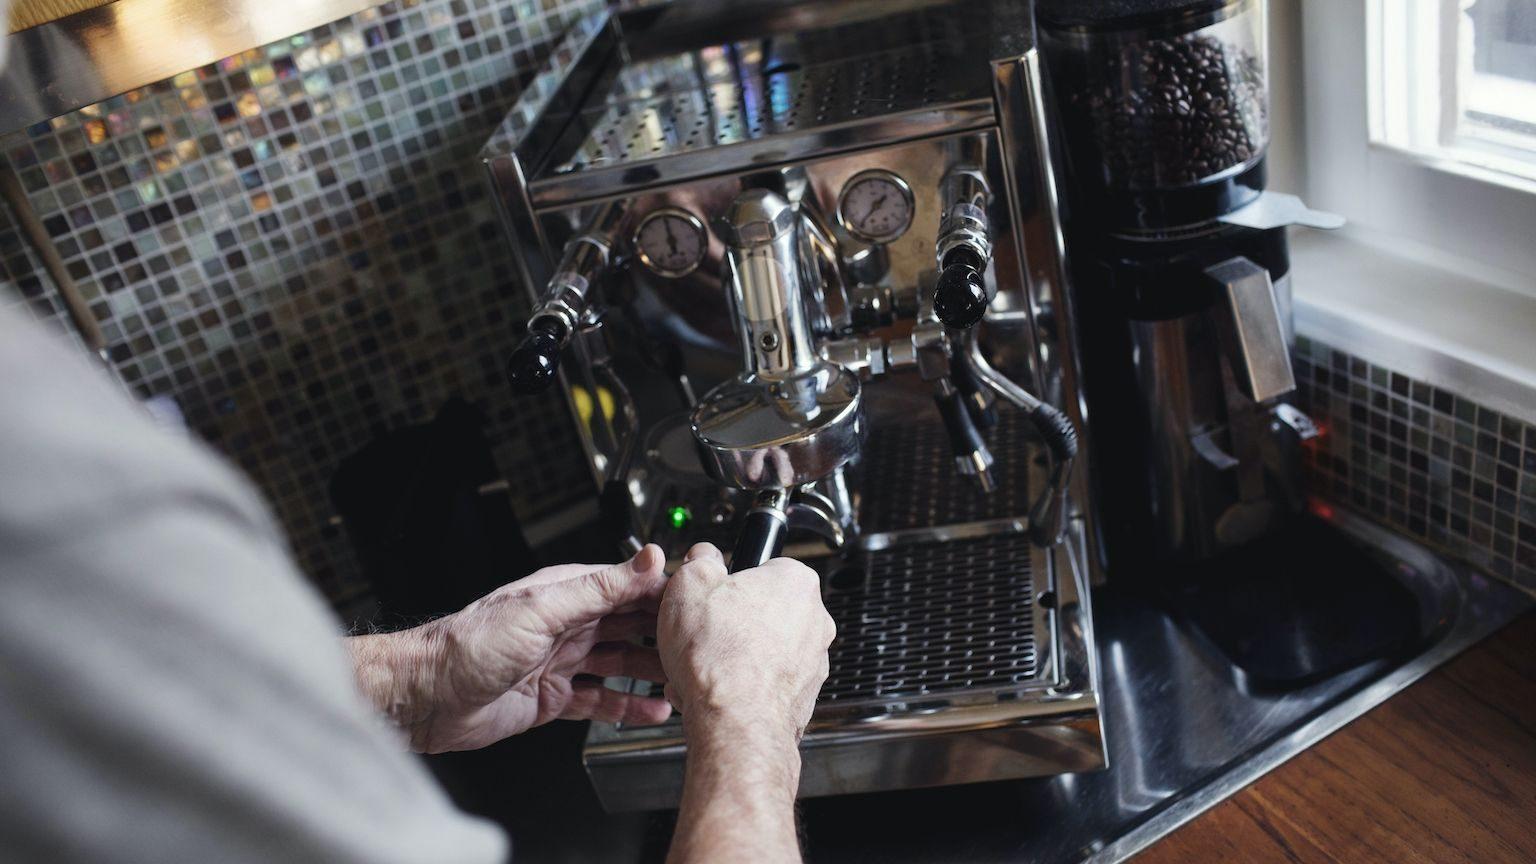 Man making coffee with an espresso machine